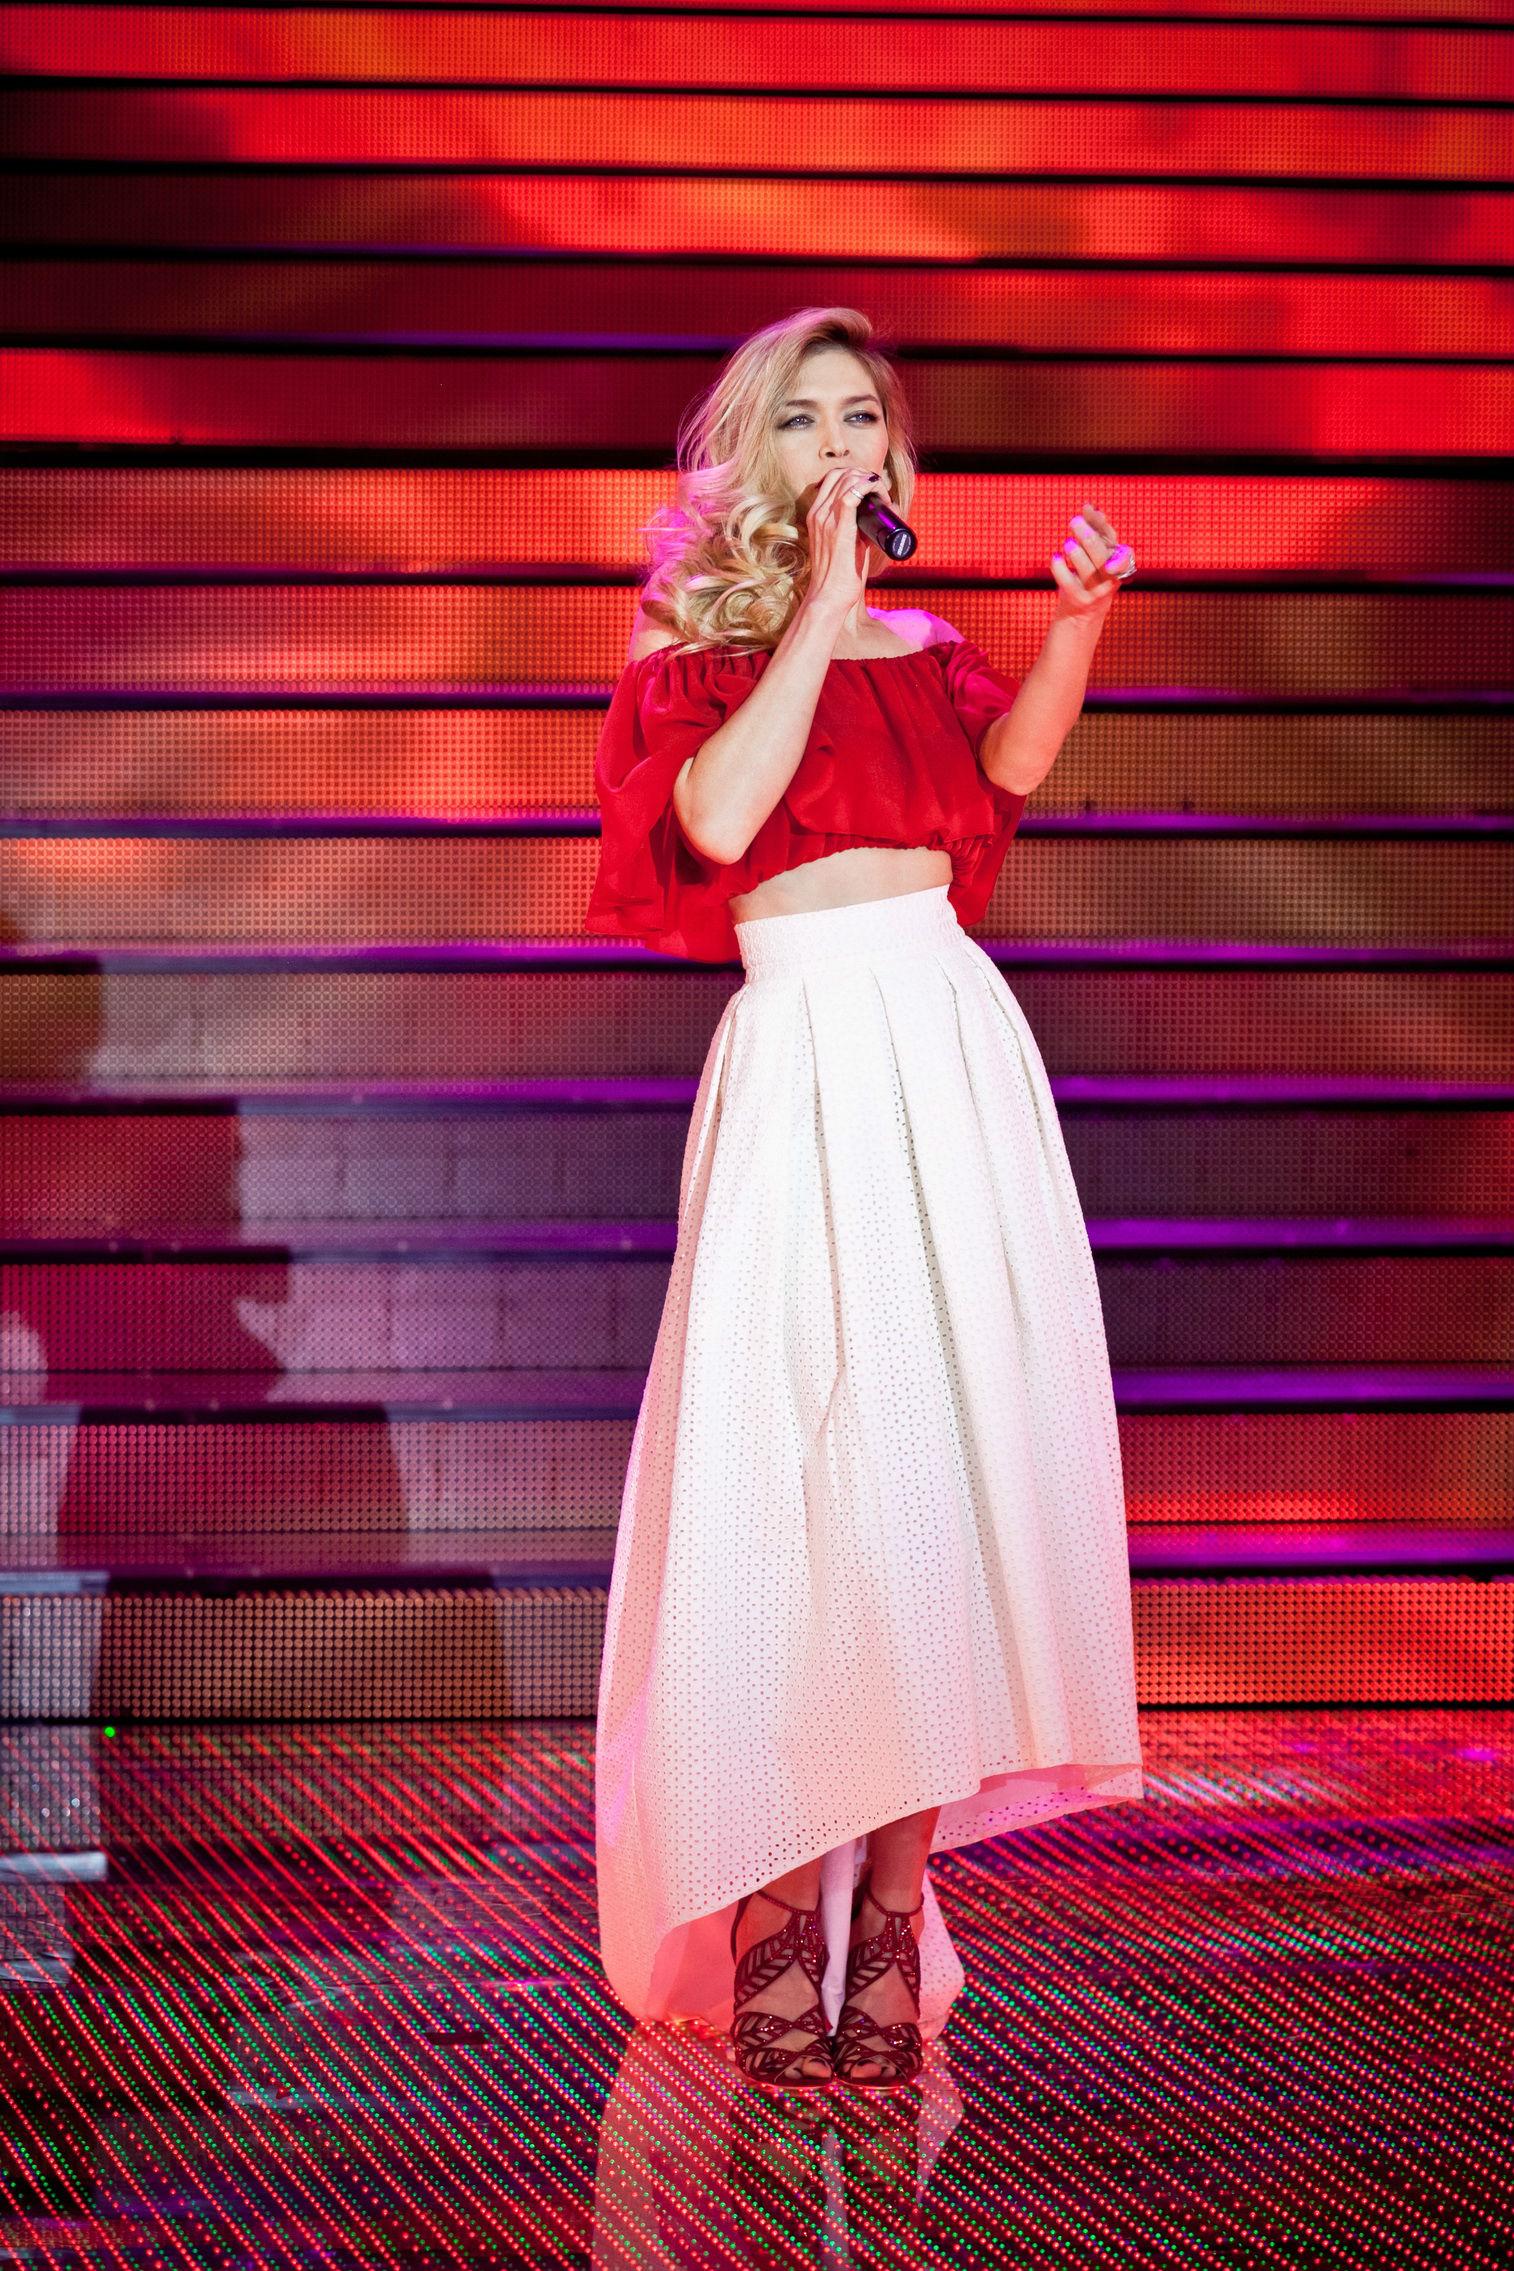 Голая Вера Брежнева в журналах XXL Maxim на сцене фото